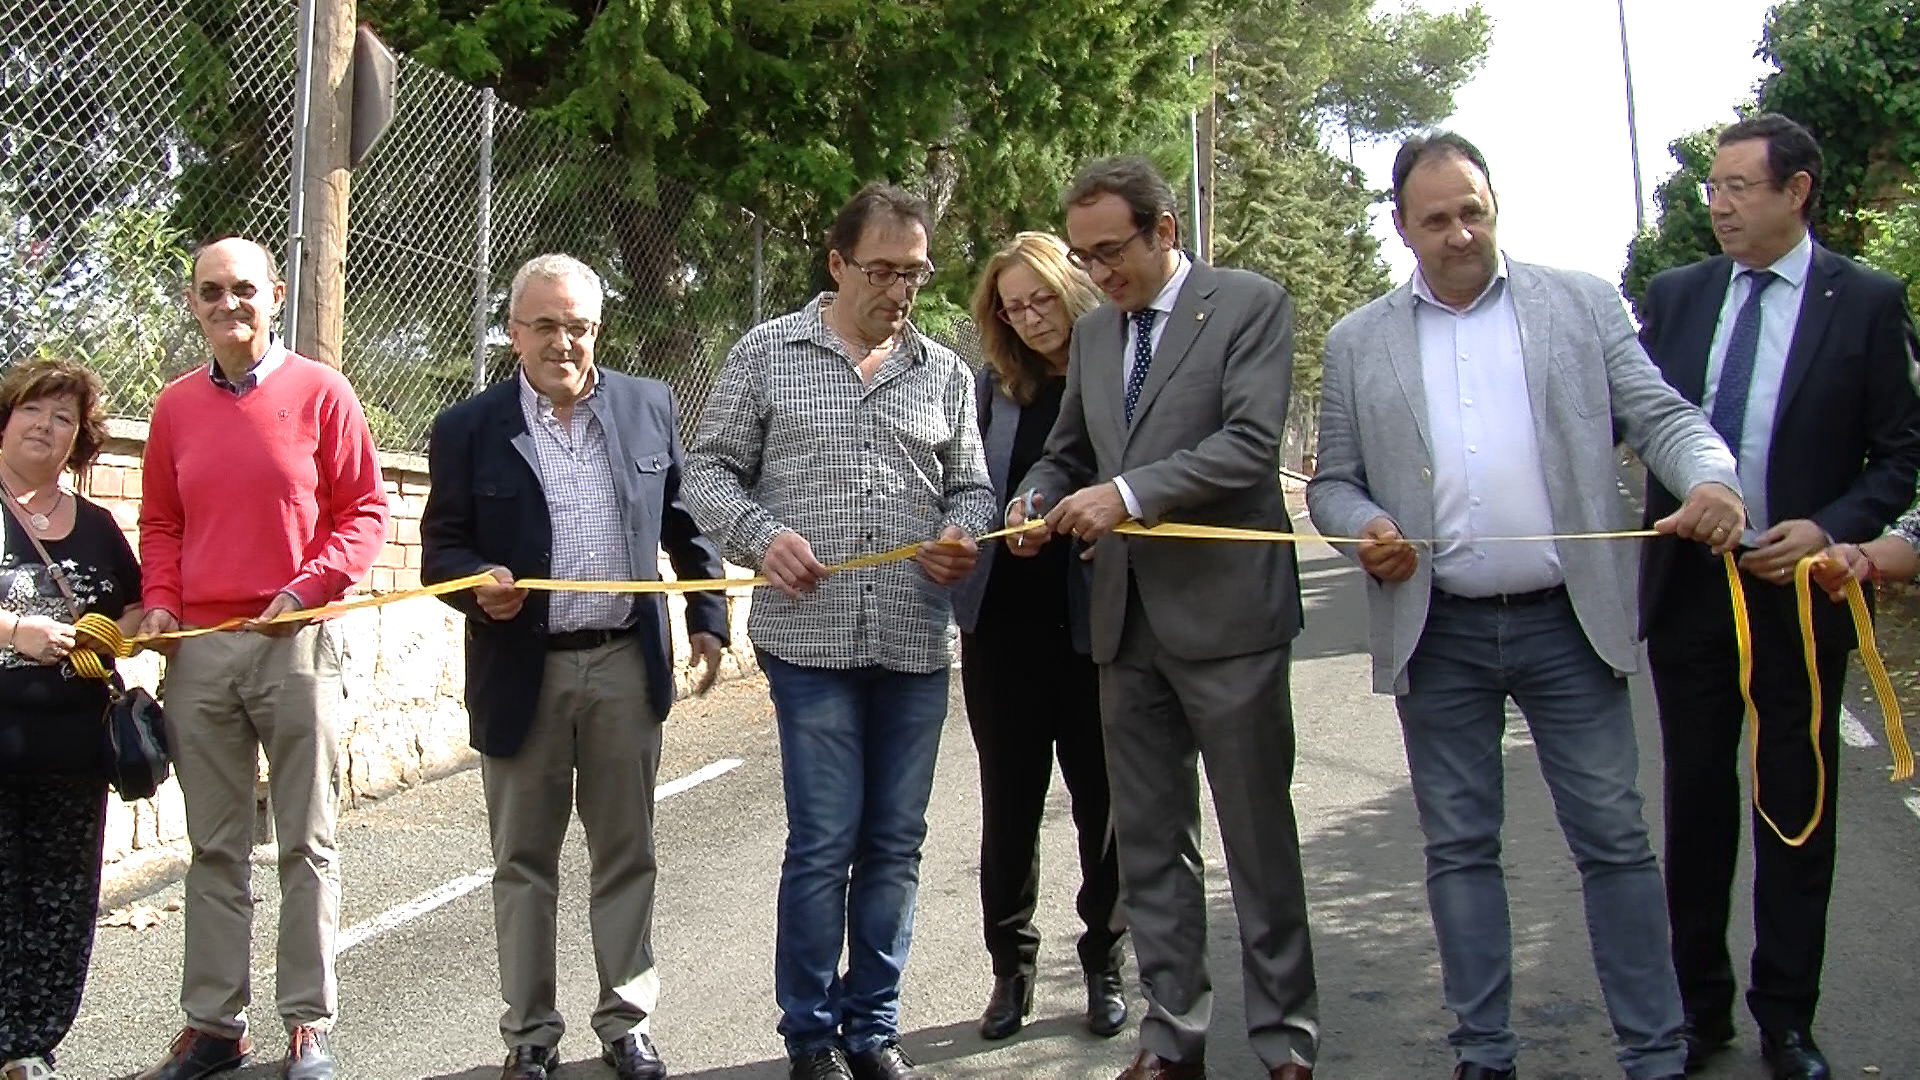 Inauguració carretera.00_00_08_24.Imagen fija002